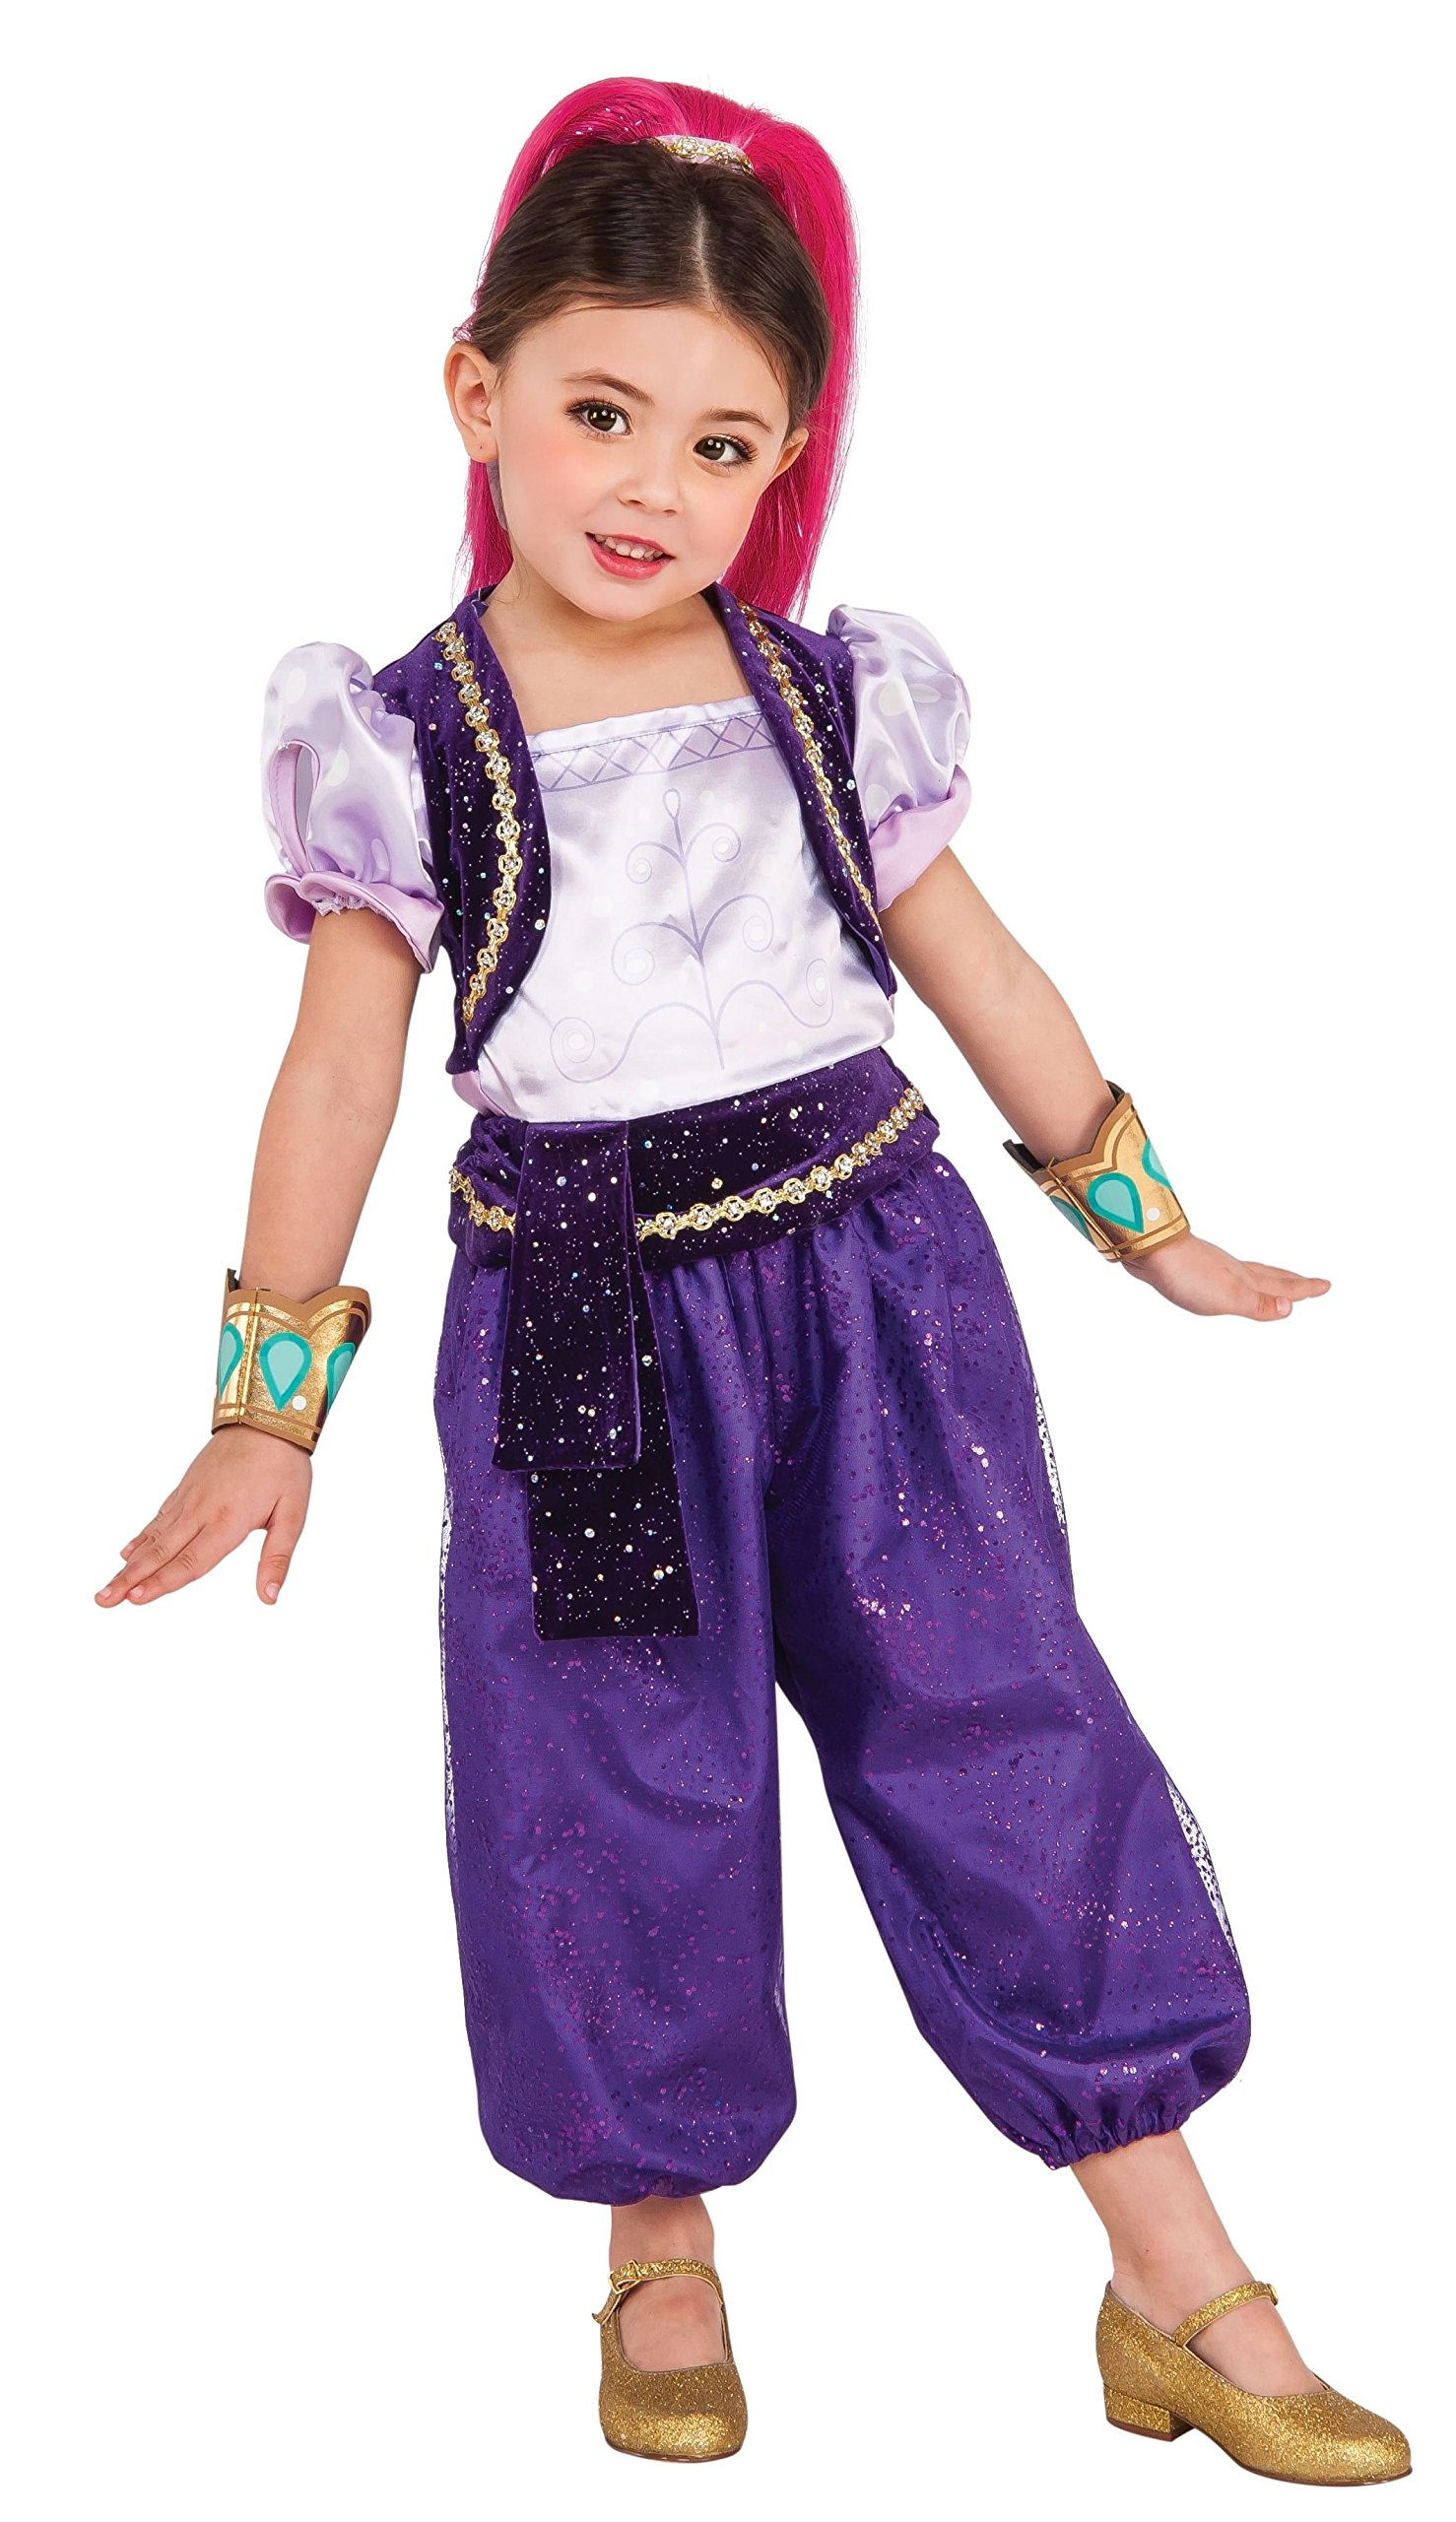 Rubie's Costume Shimmer & Shine Deluxe Shimmer Costume, Small